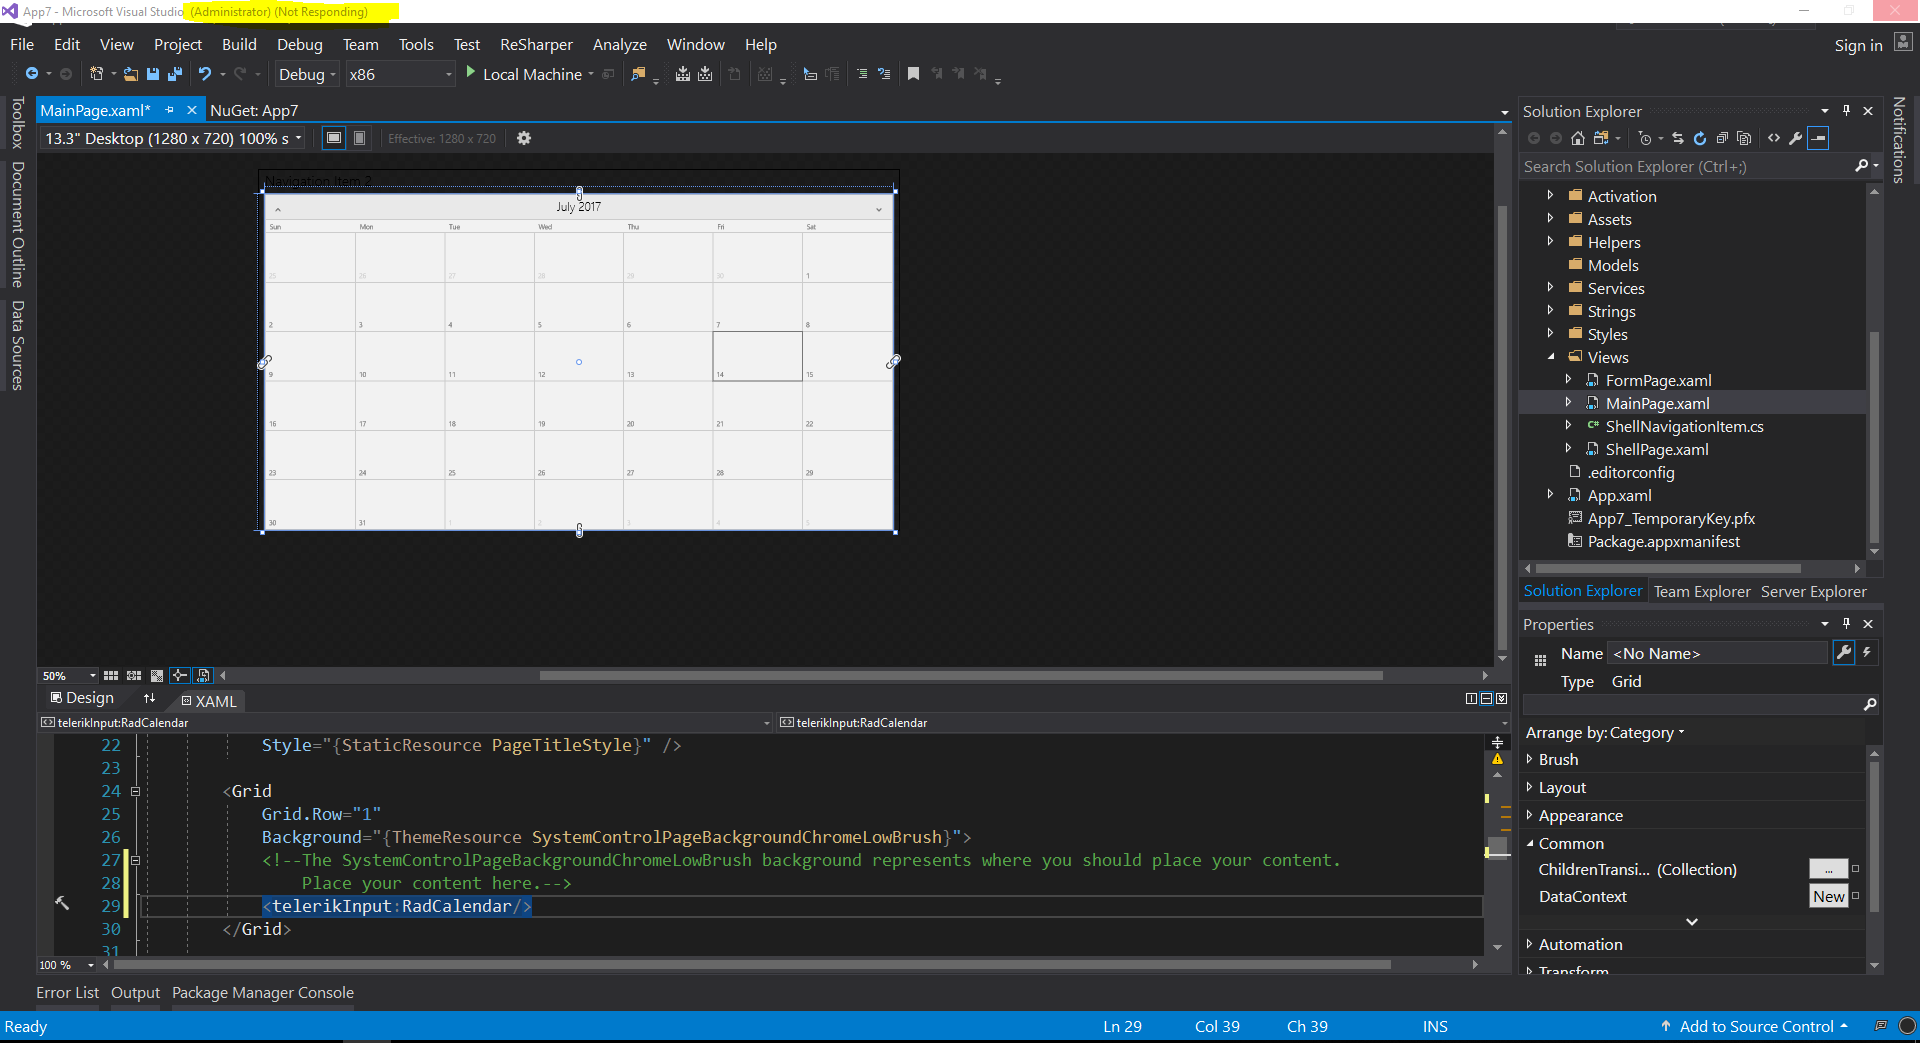 Visual Studio 2017 (Not responding) with Telerik/UI